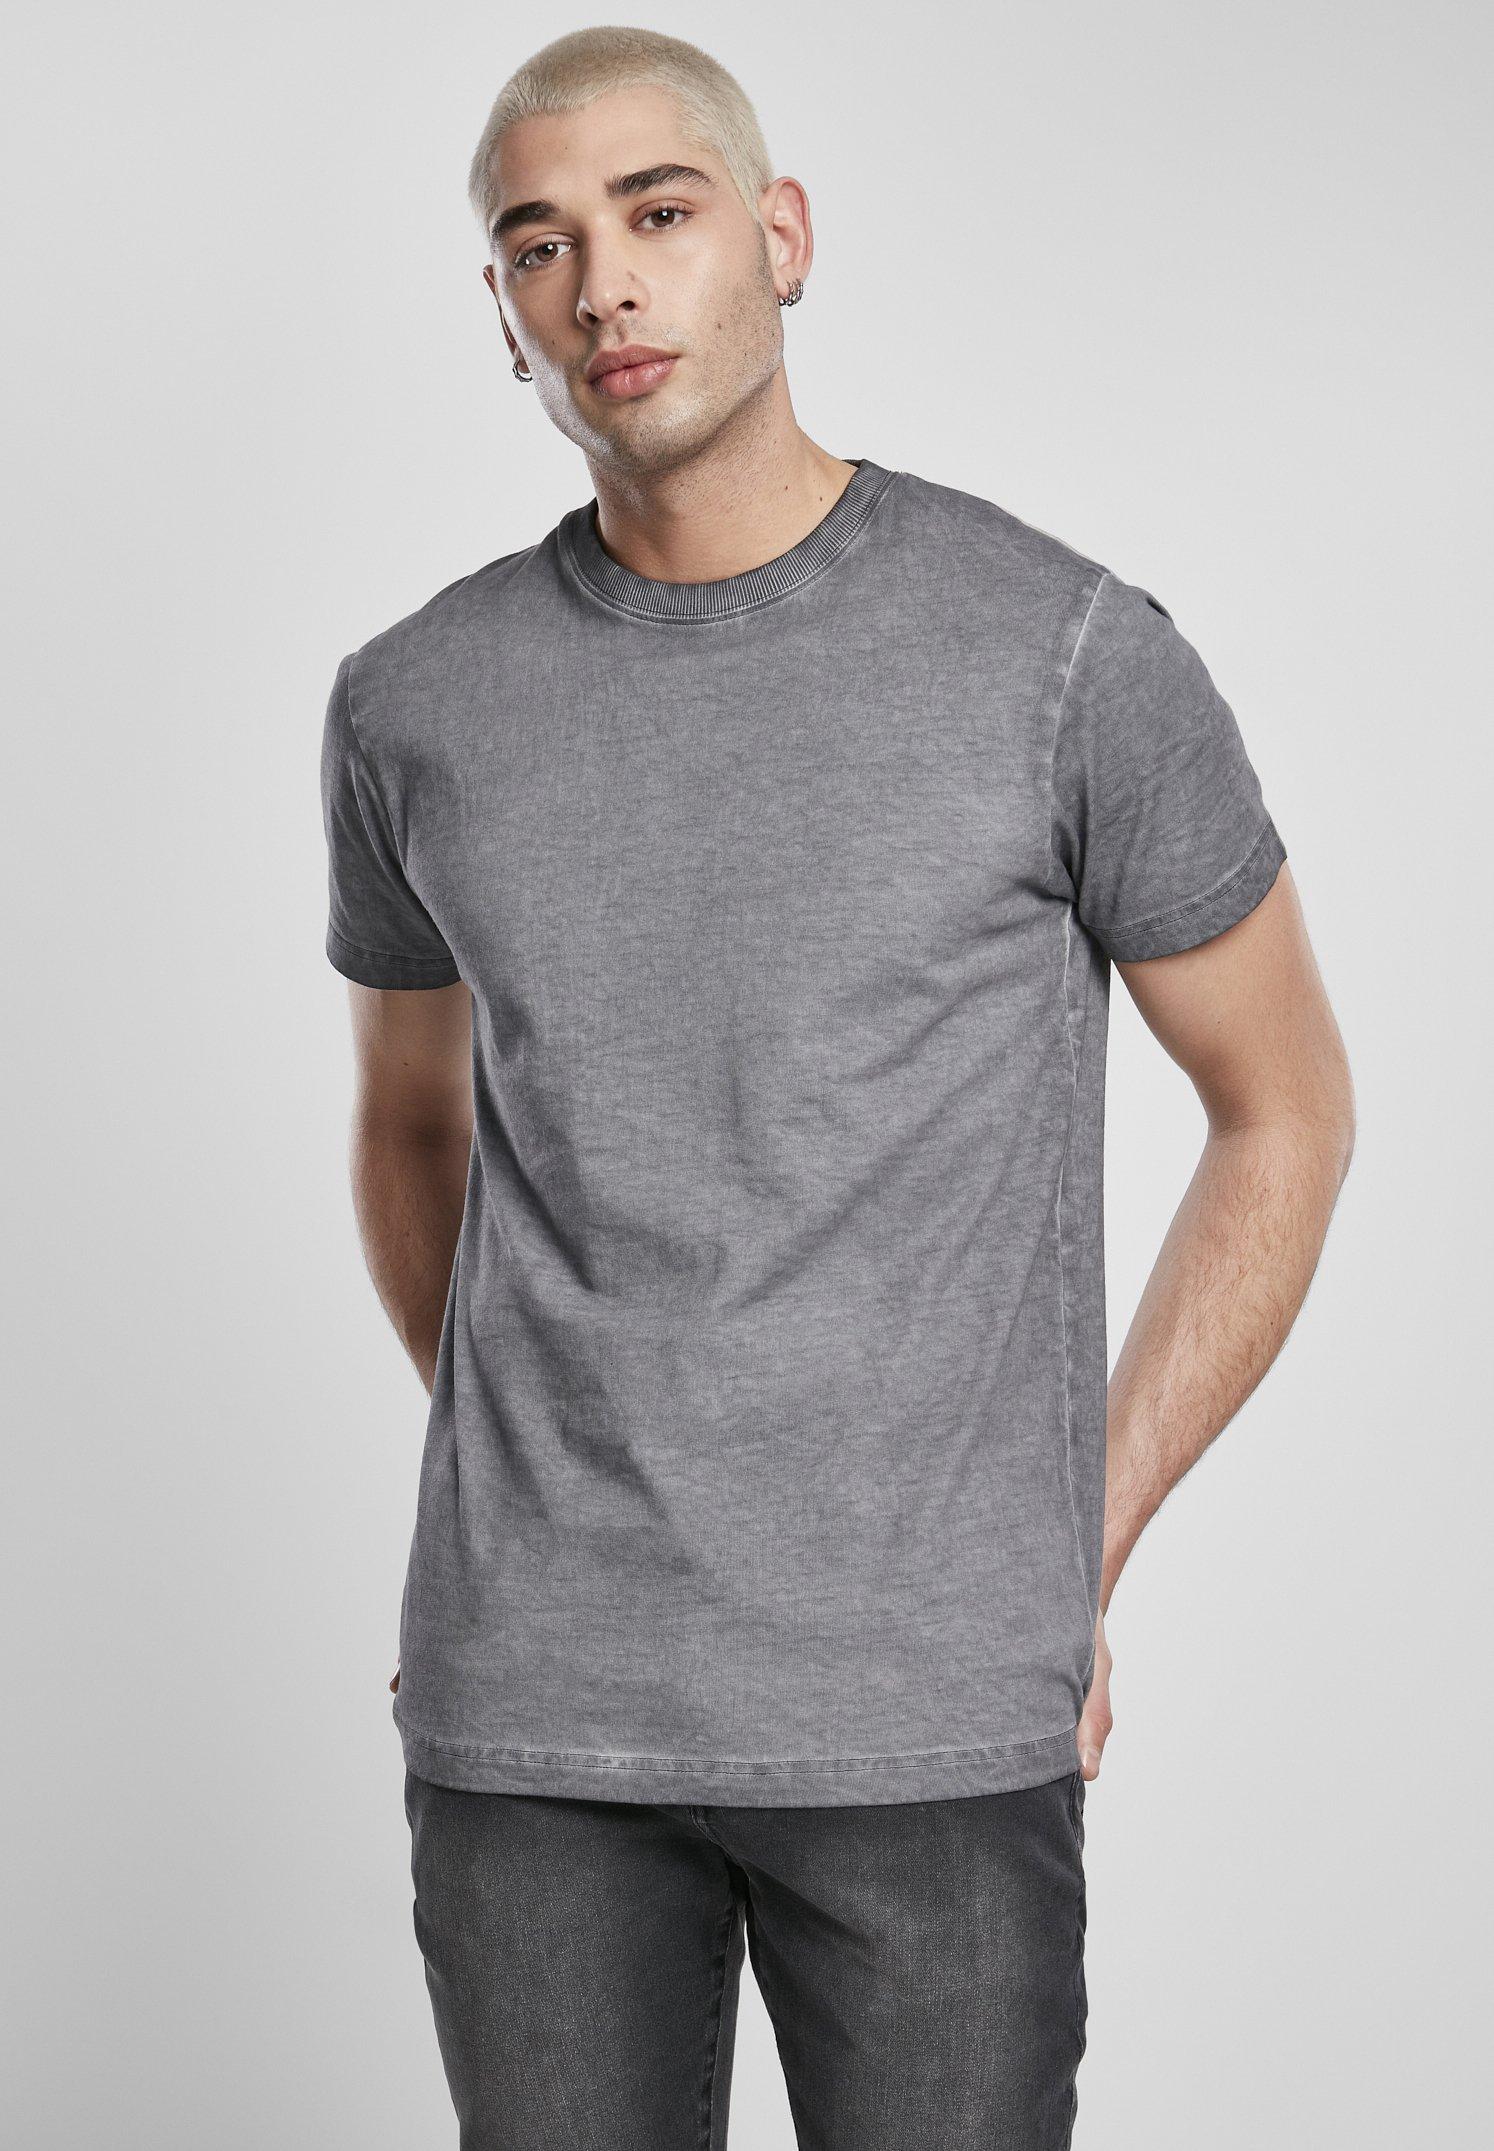 Homme MÄNNER GRUNGE - T-shirt basique